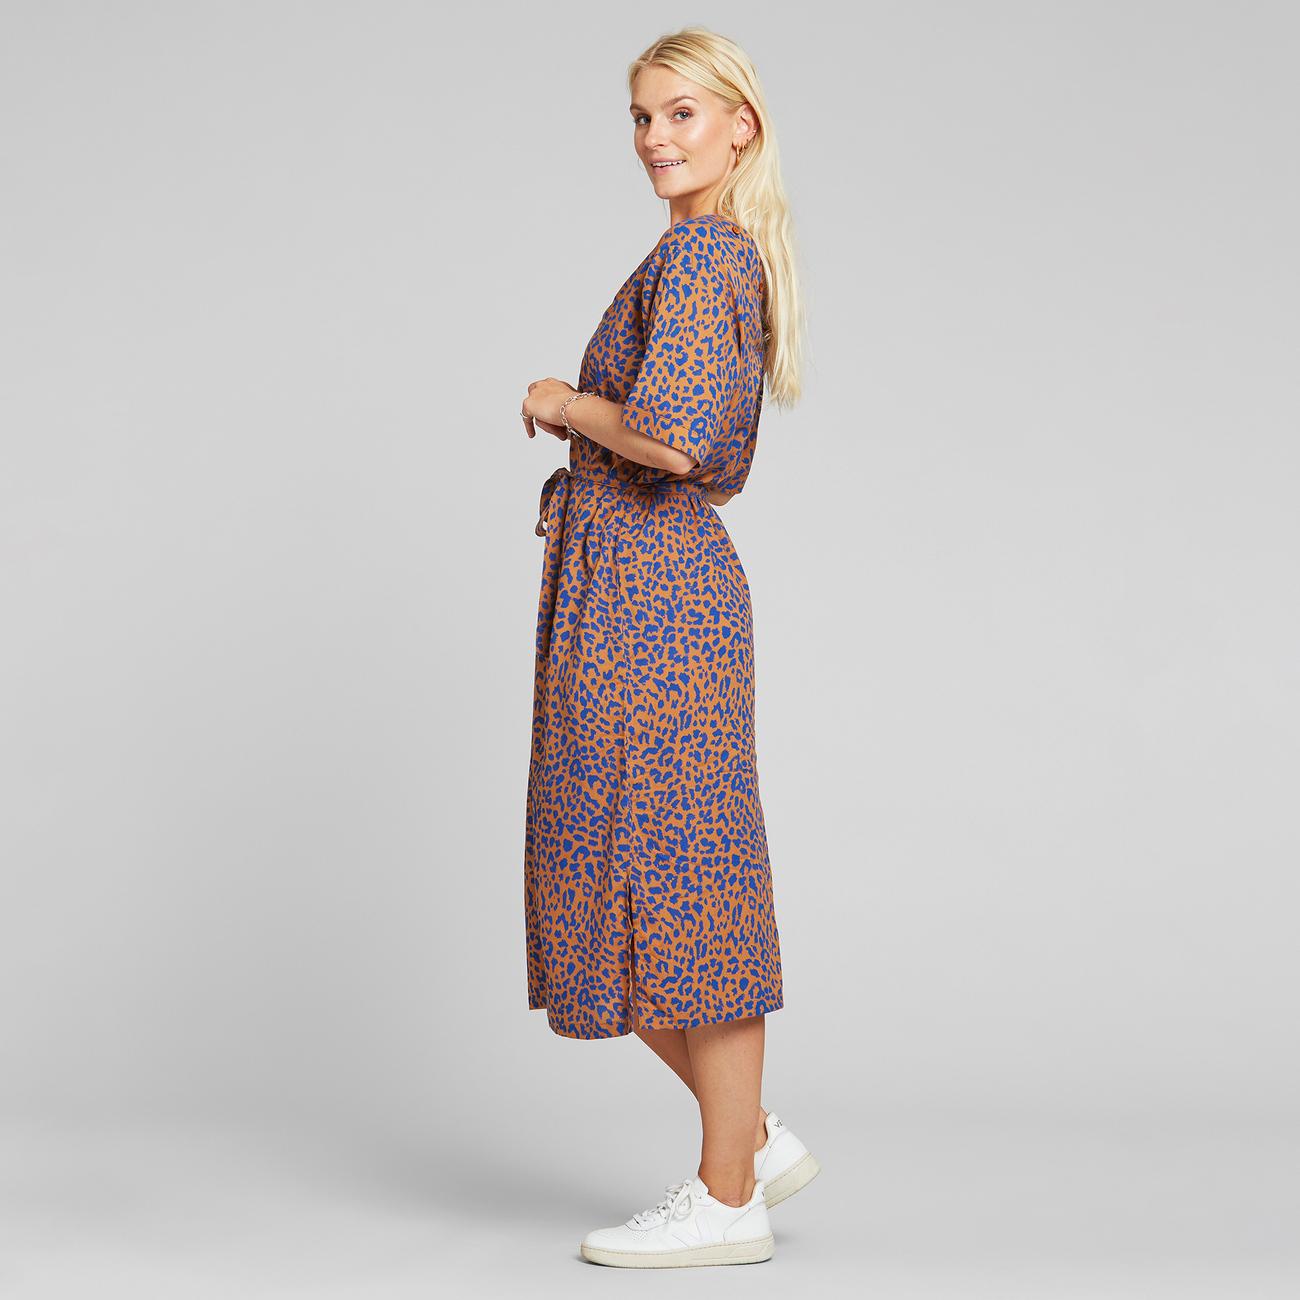 Dress Bornholm Leopard Light Brown